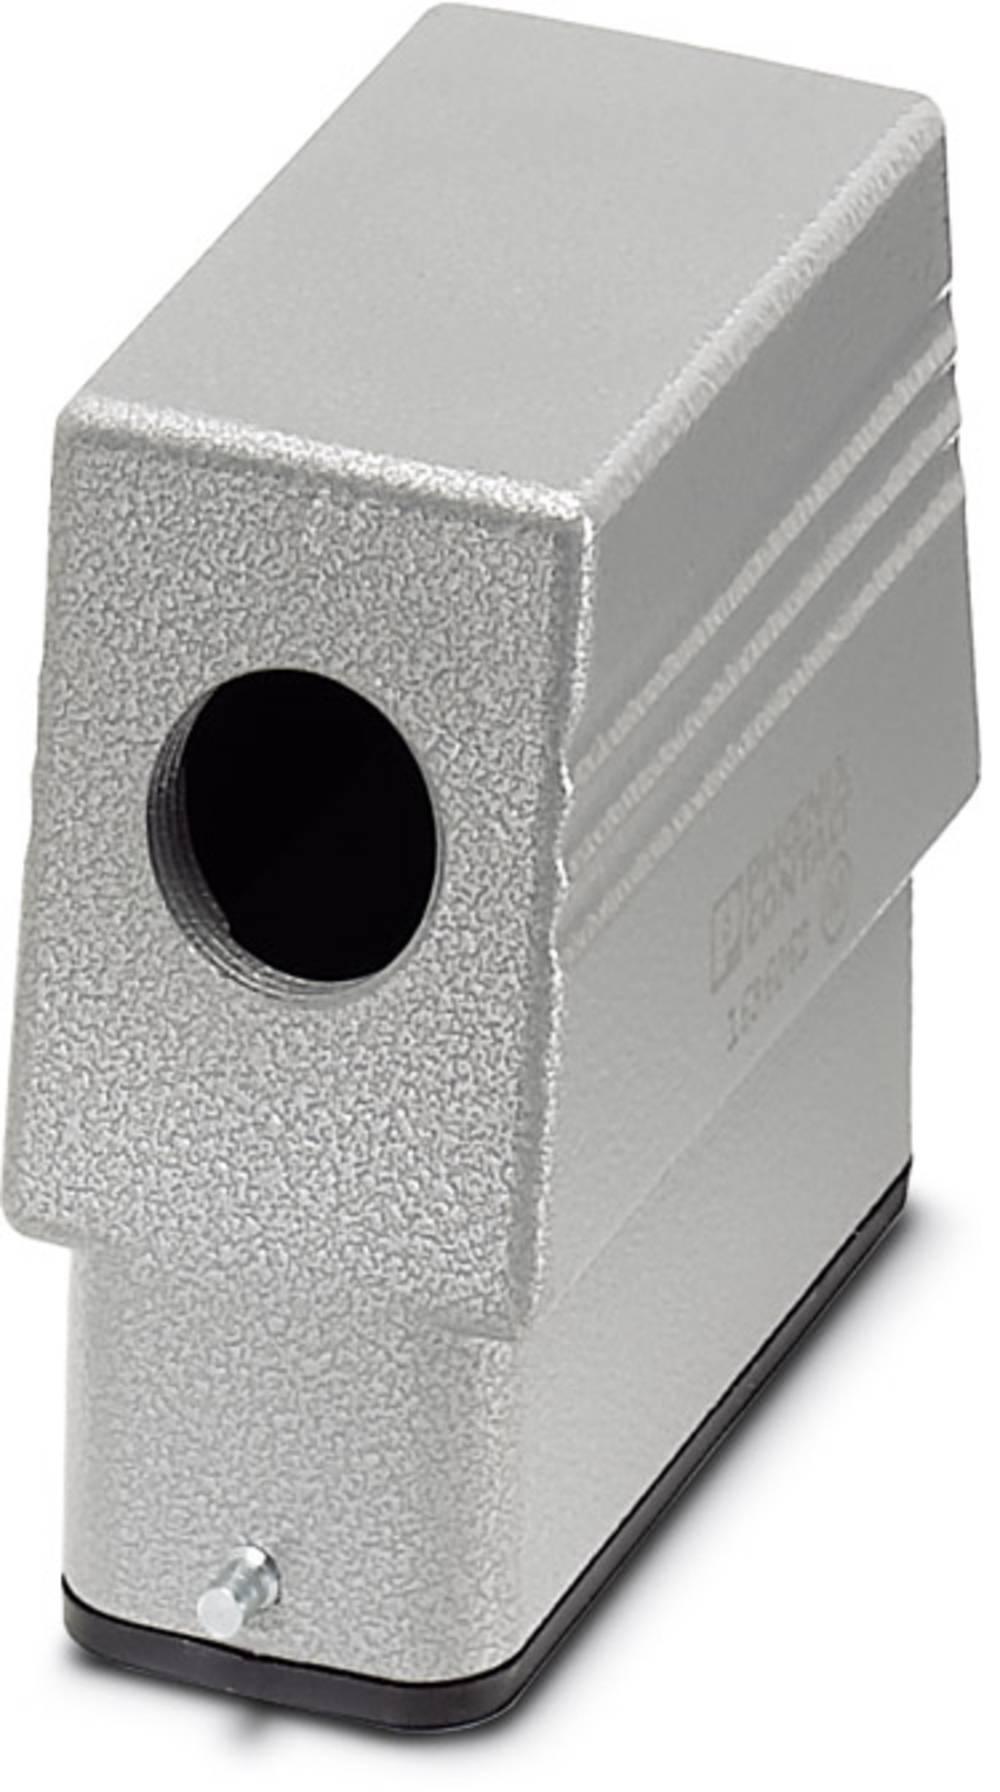 Ohišje nastavkov HC-D 25-TFL-72 / O1STM20S 1636062 Phoenix Contact 10 kosov